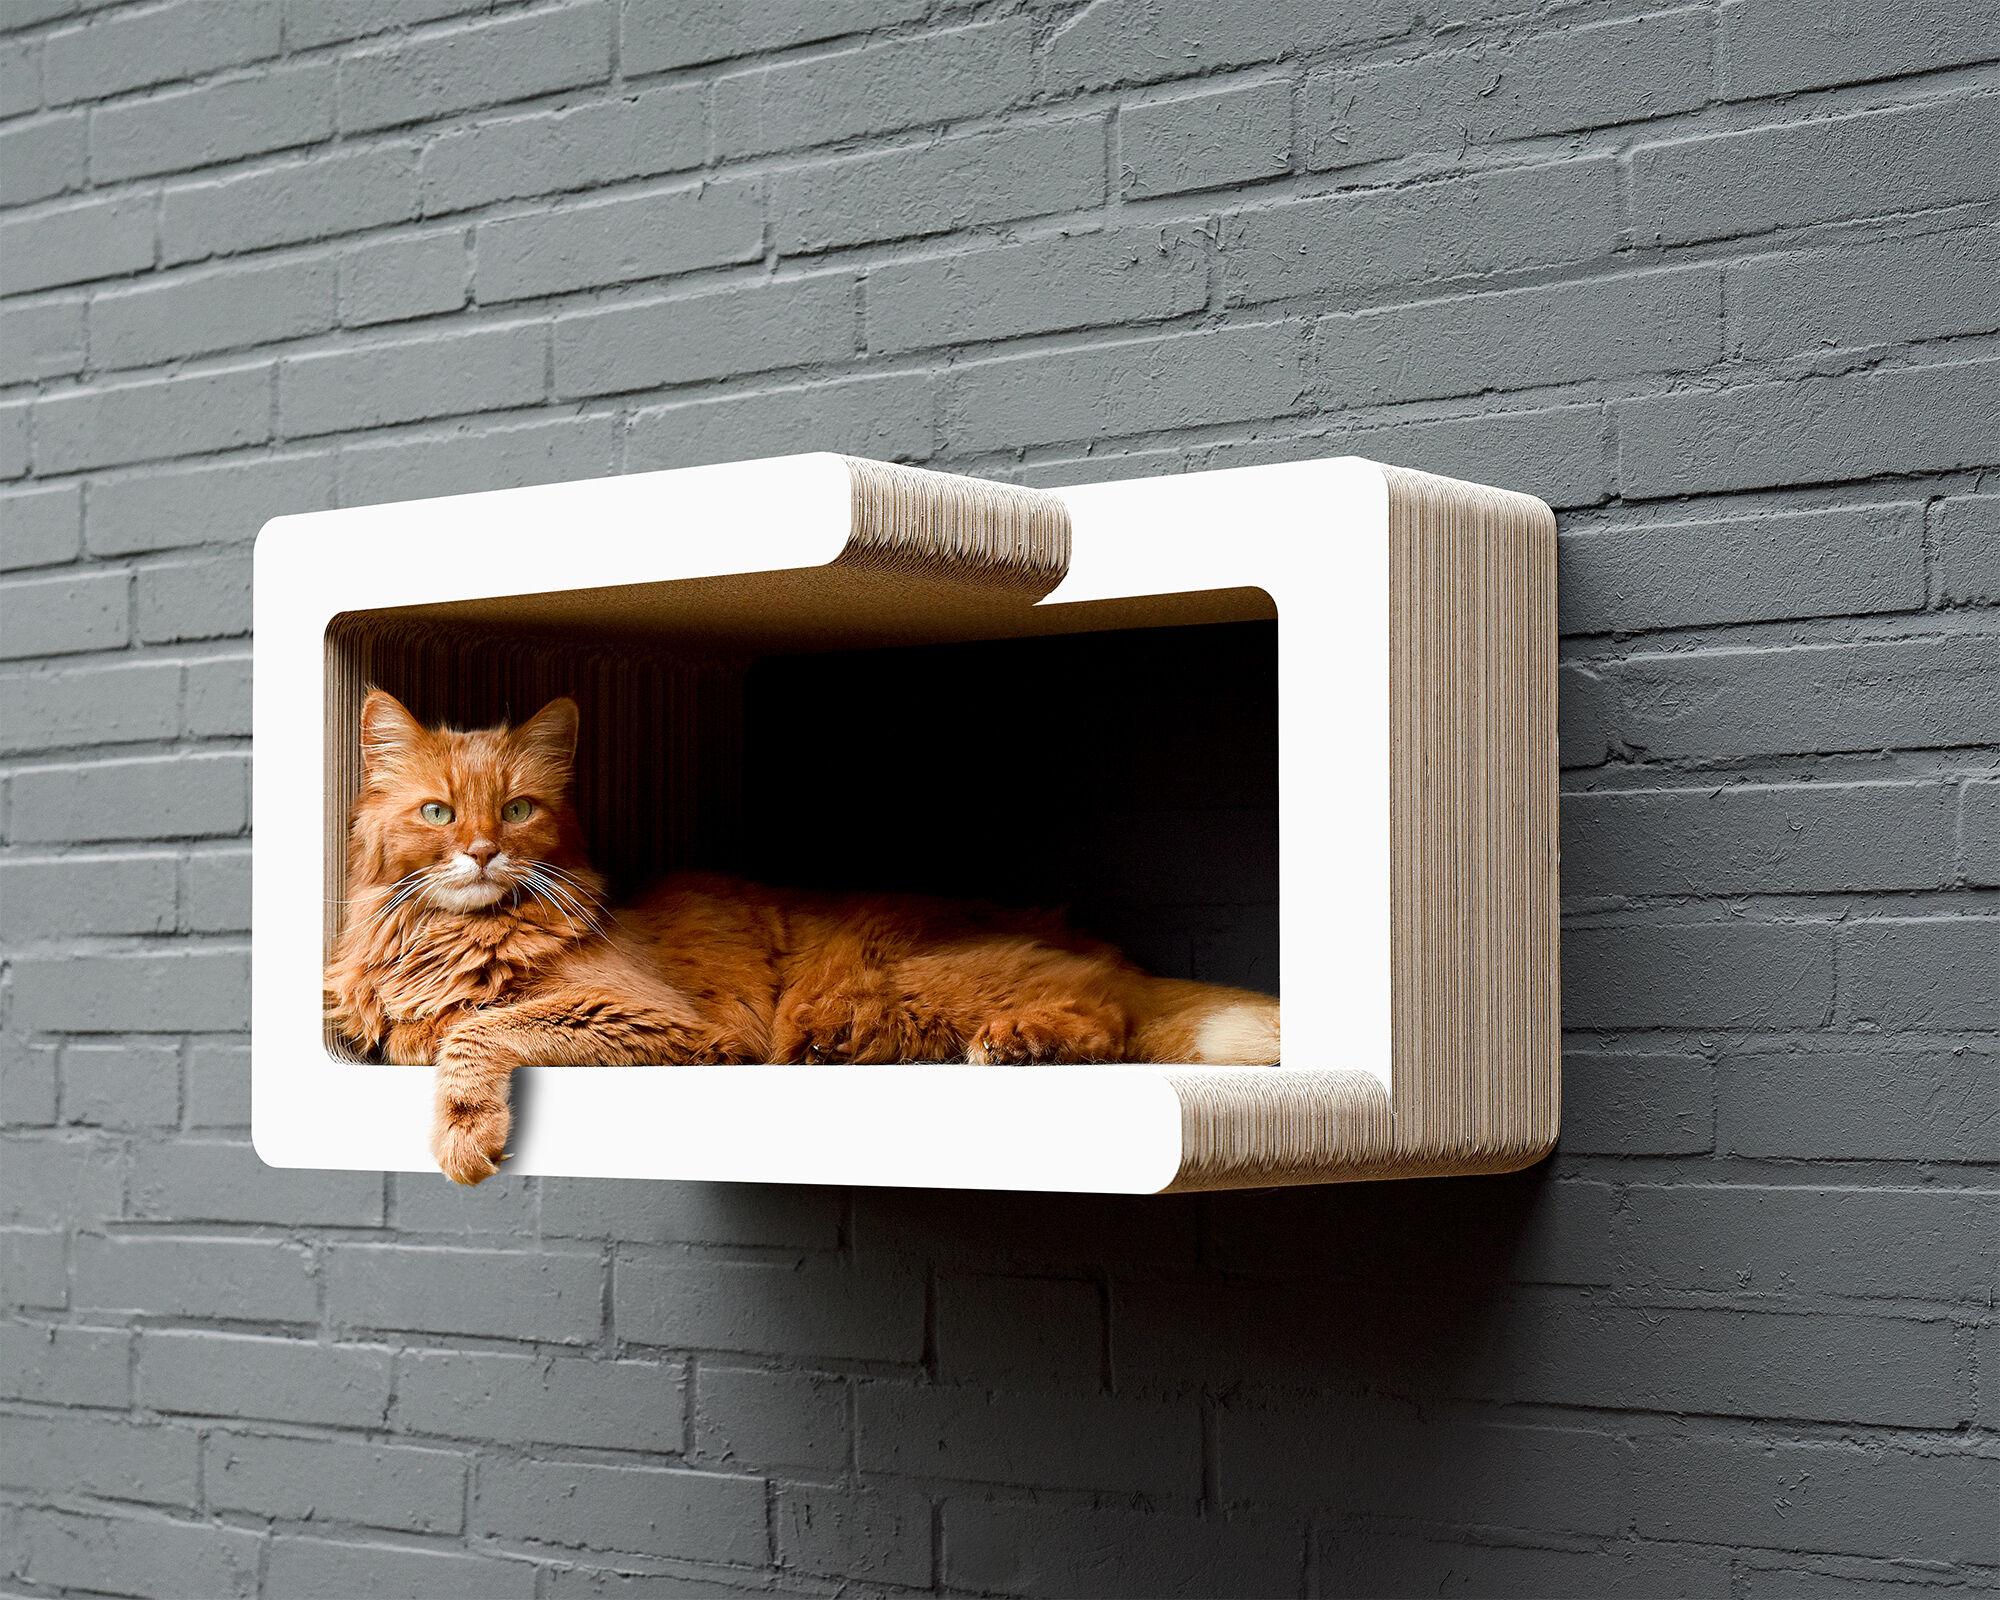 KIO TADASHI Katzen-Wandkratzmöbel weiß